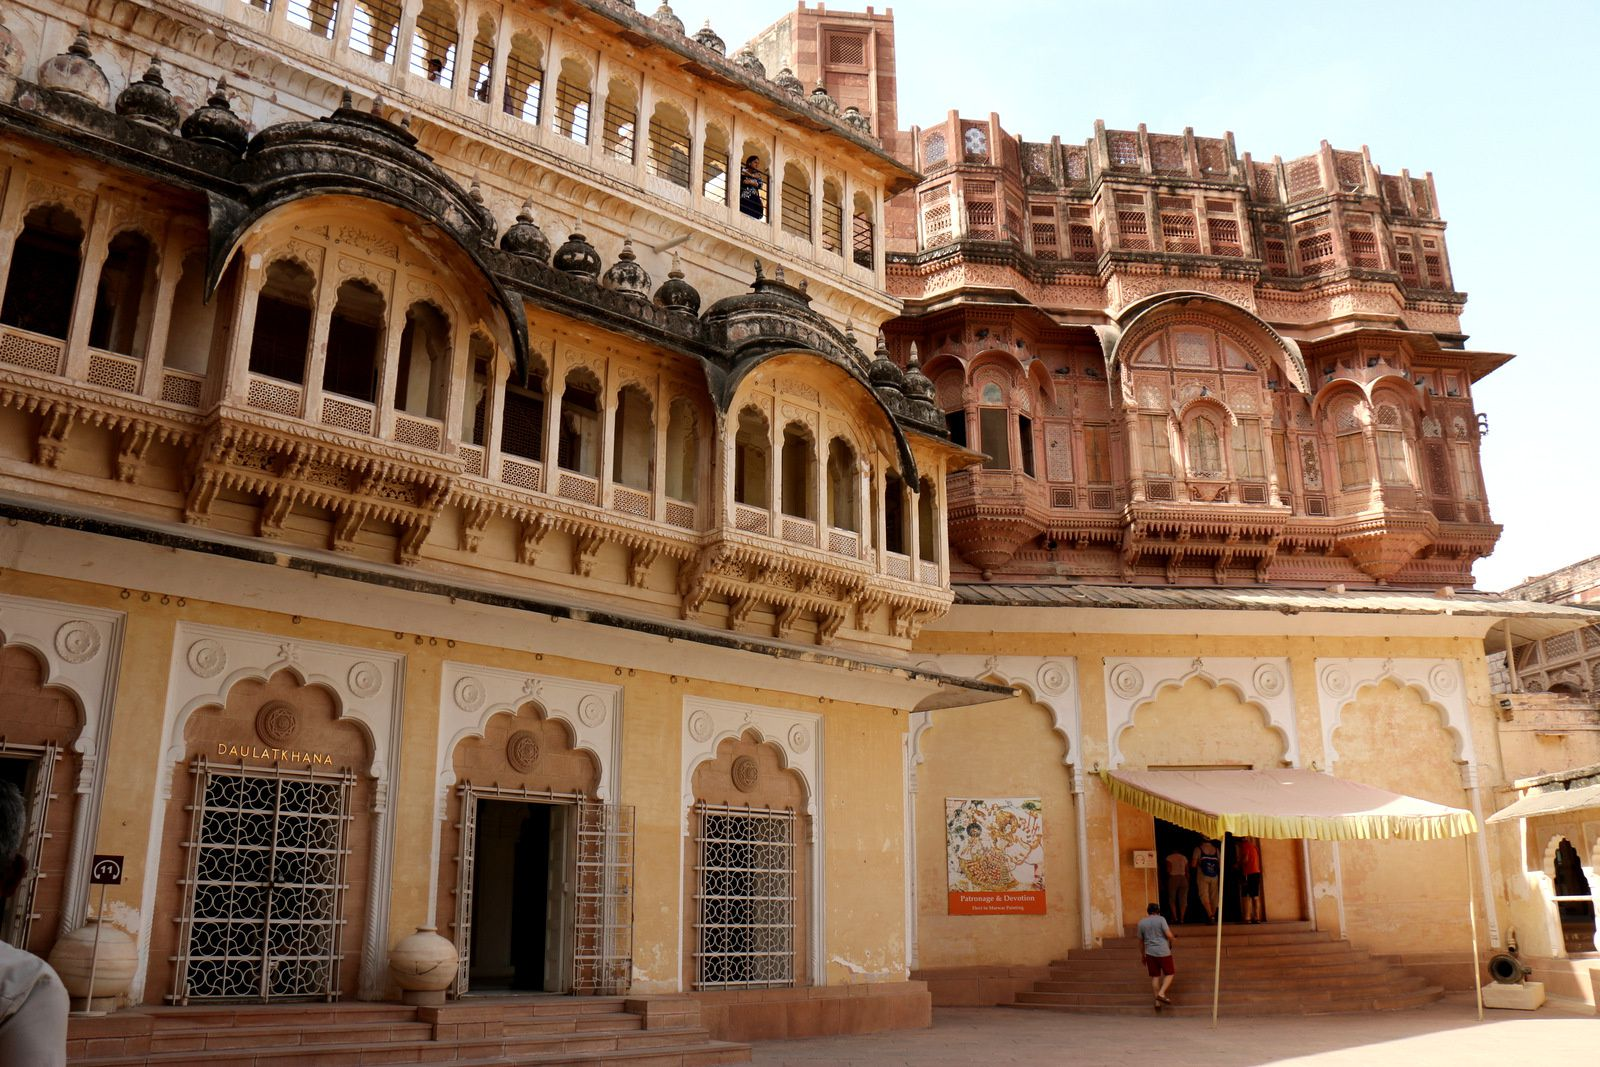 Palanquin Mahadol, musée de Mehrangarh (Jodhpur, Inde)